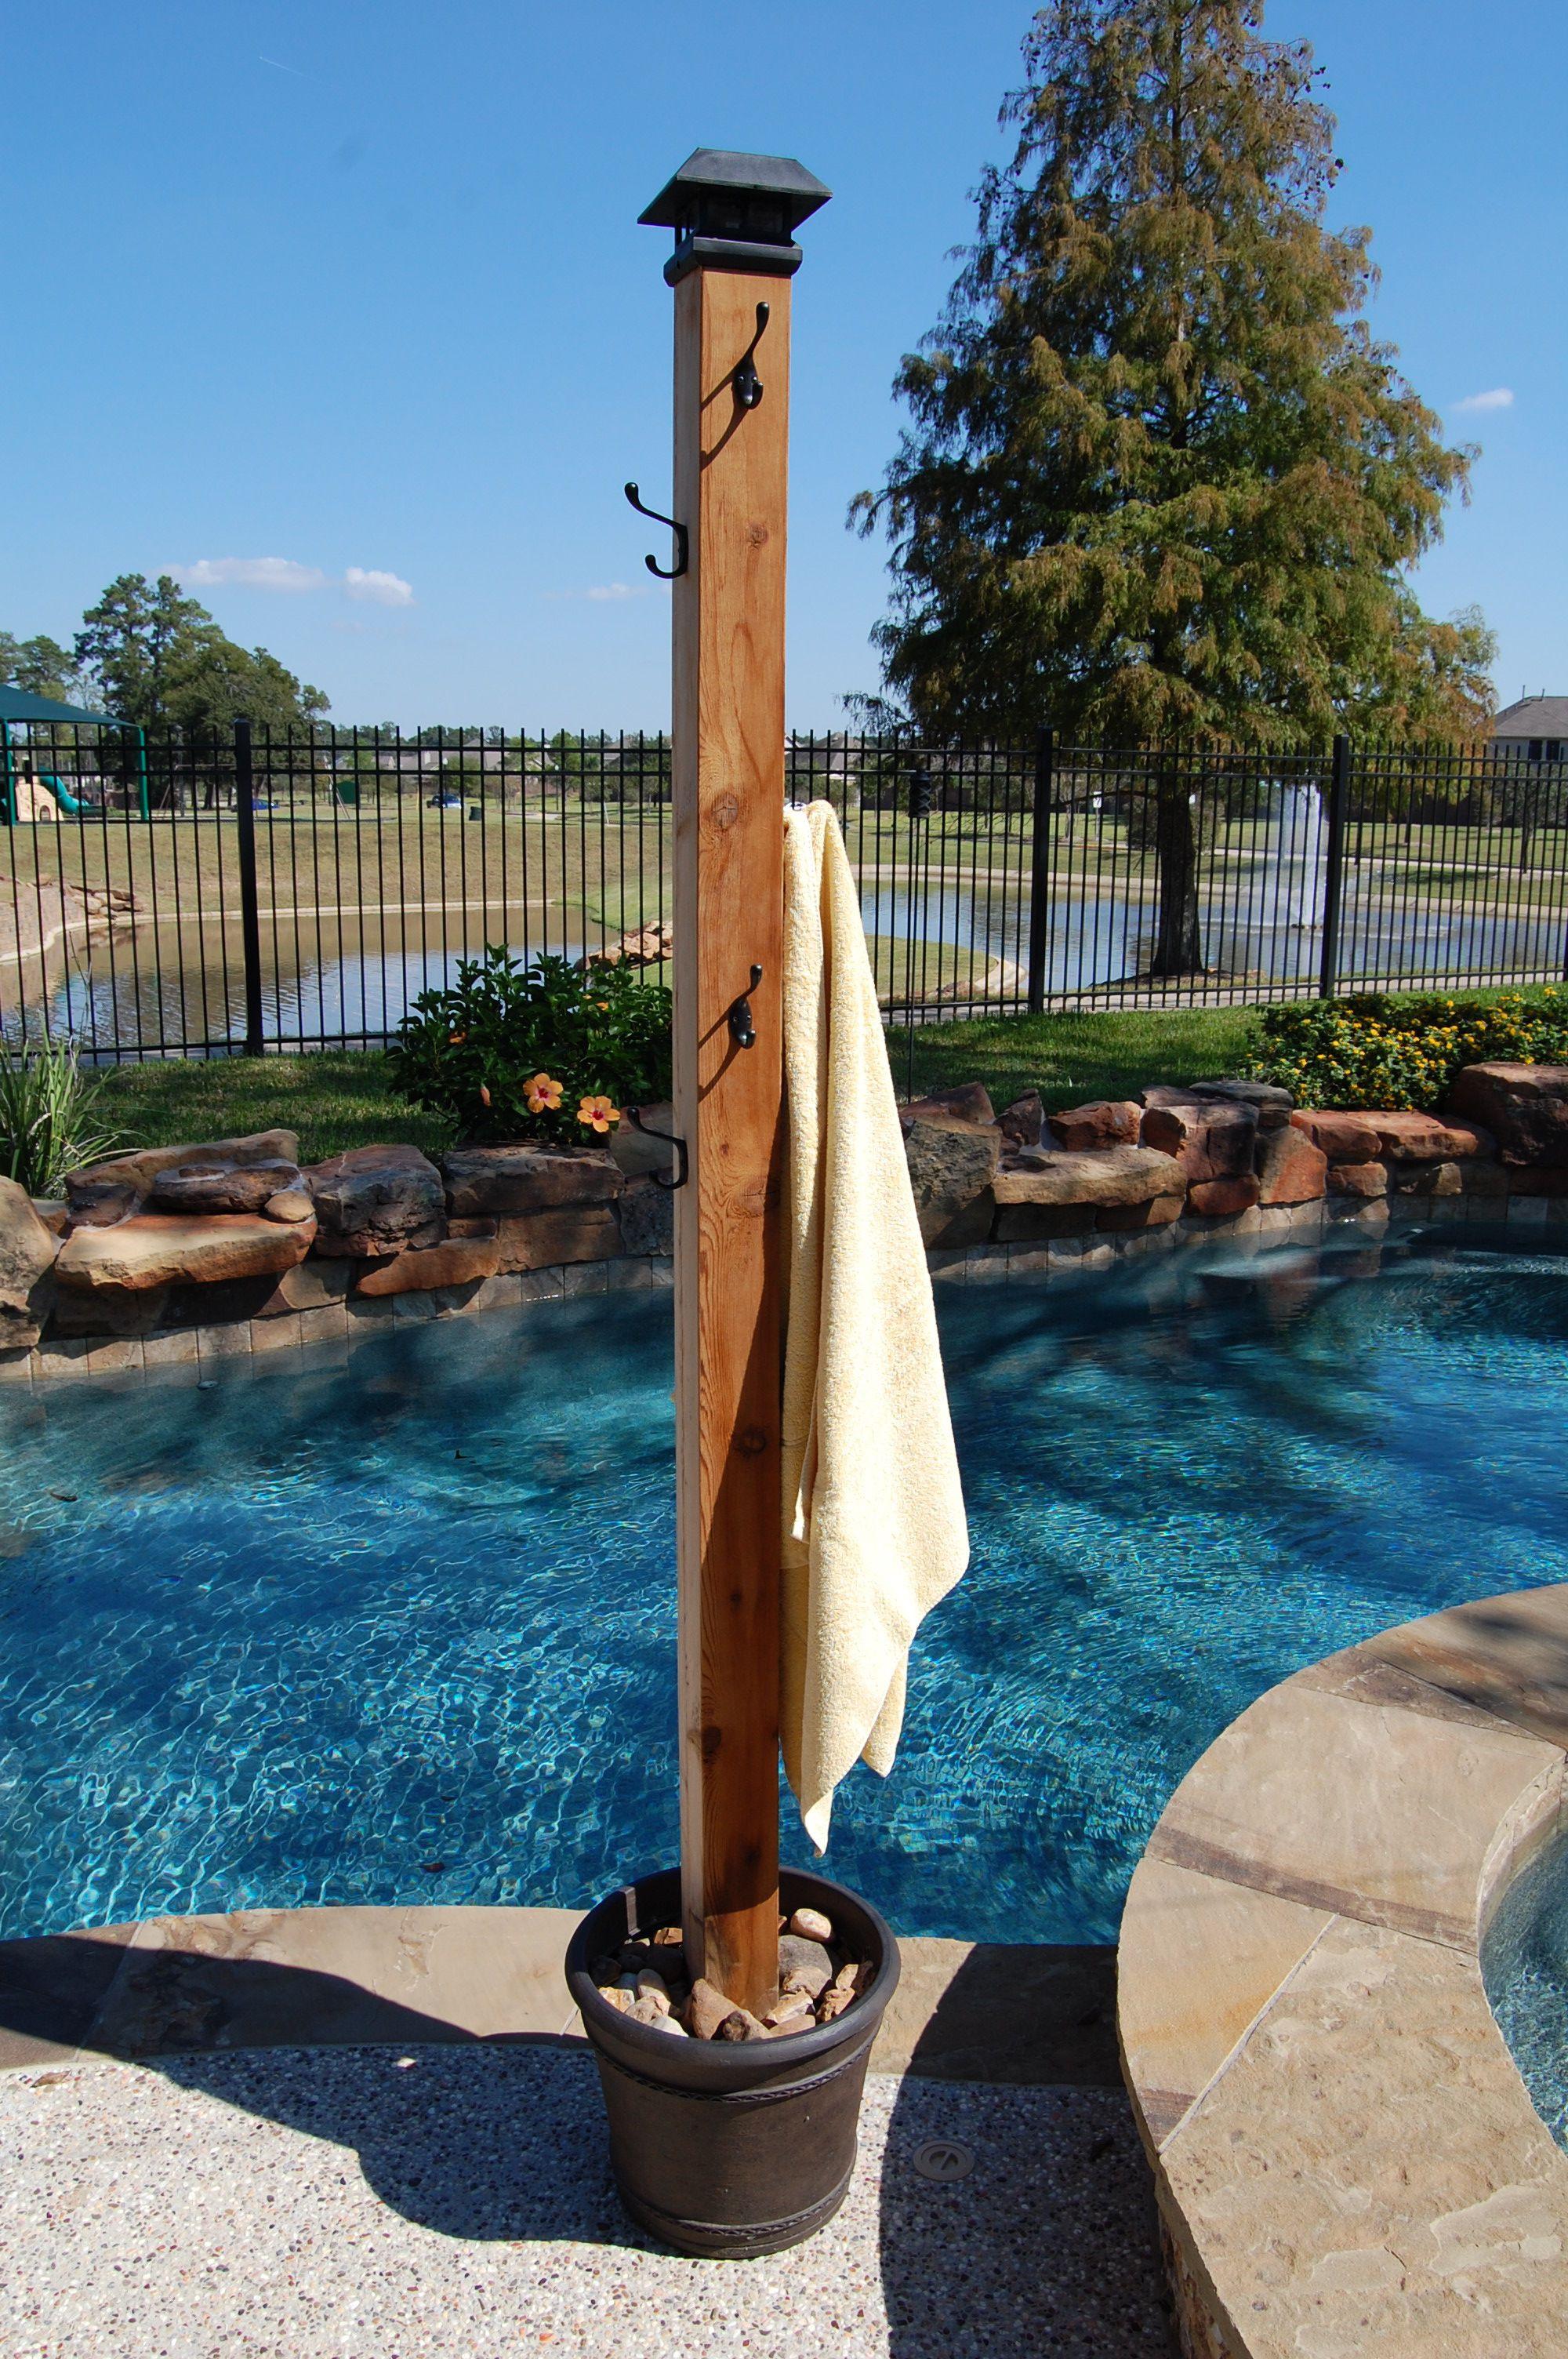 Best ideas about DIY Outdoor Towel Rack . Save or Pin Poolside Towel Rack DIY Pinterest Now.